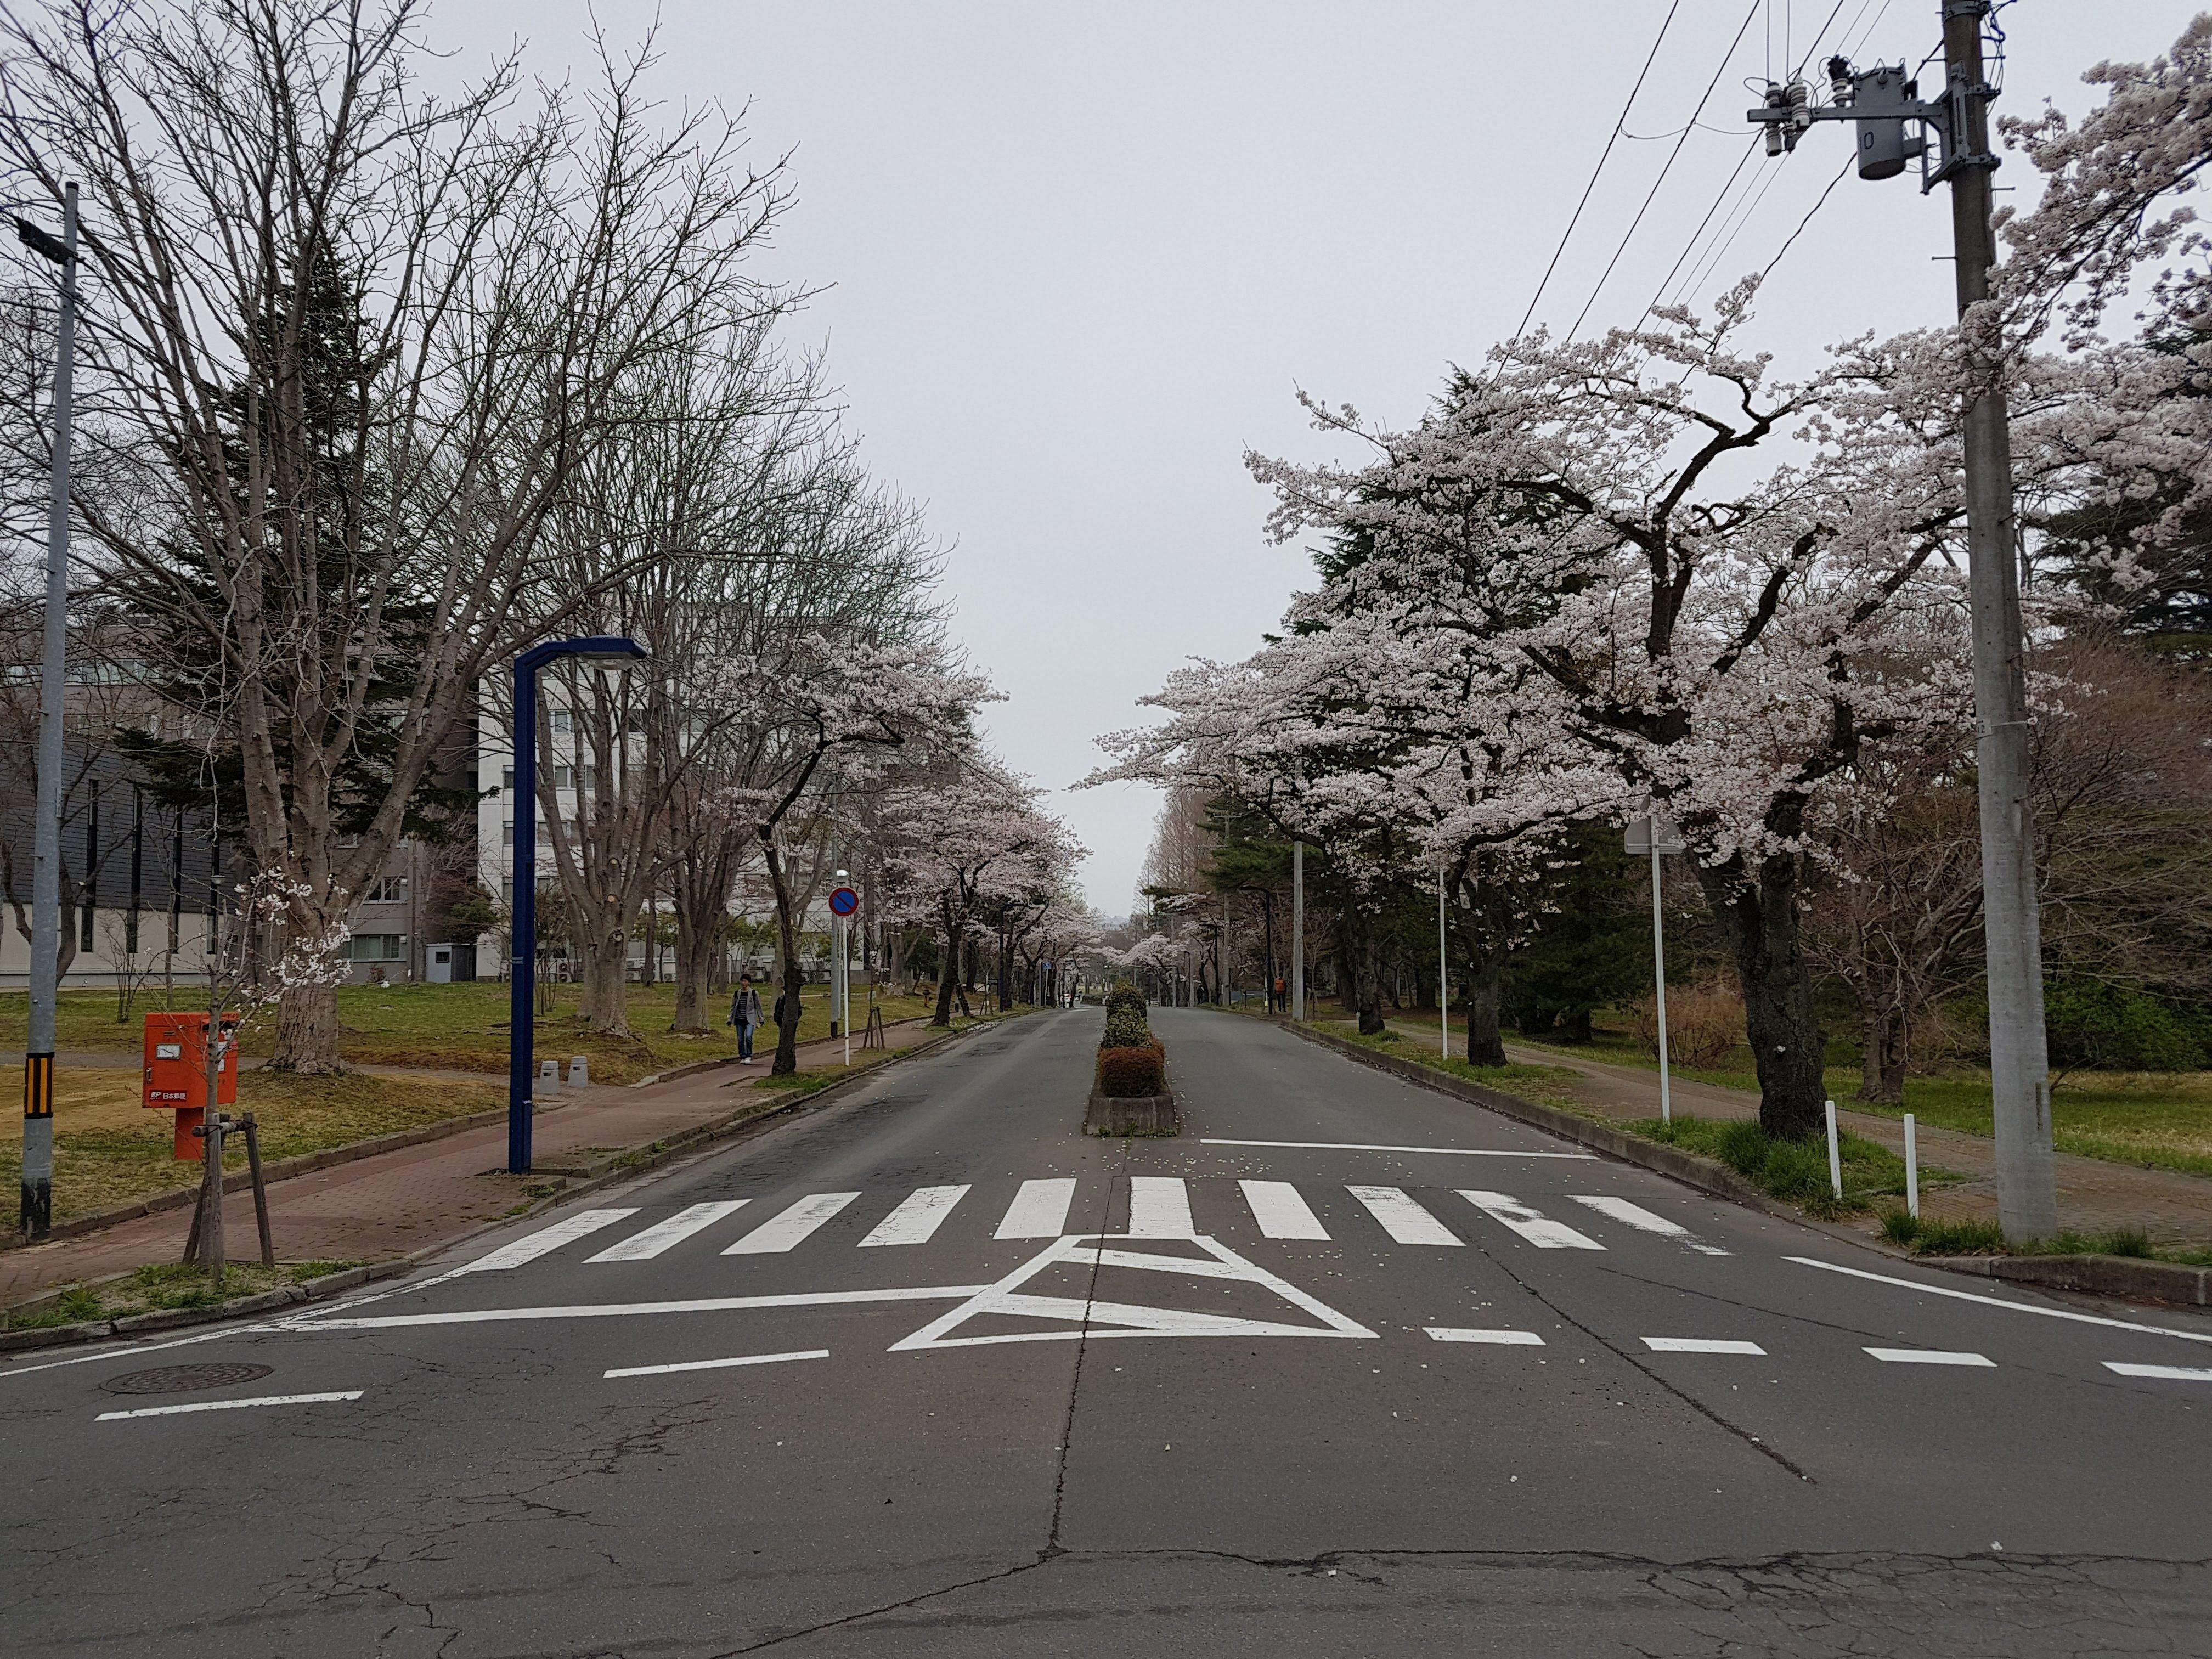 The Sakura trees on the road in spring at Katahira in Sendai, Miyagi.